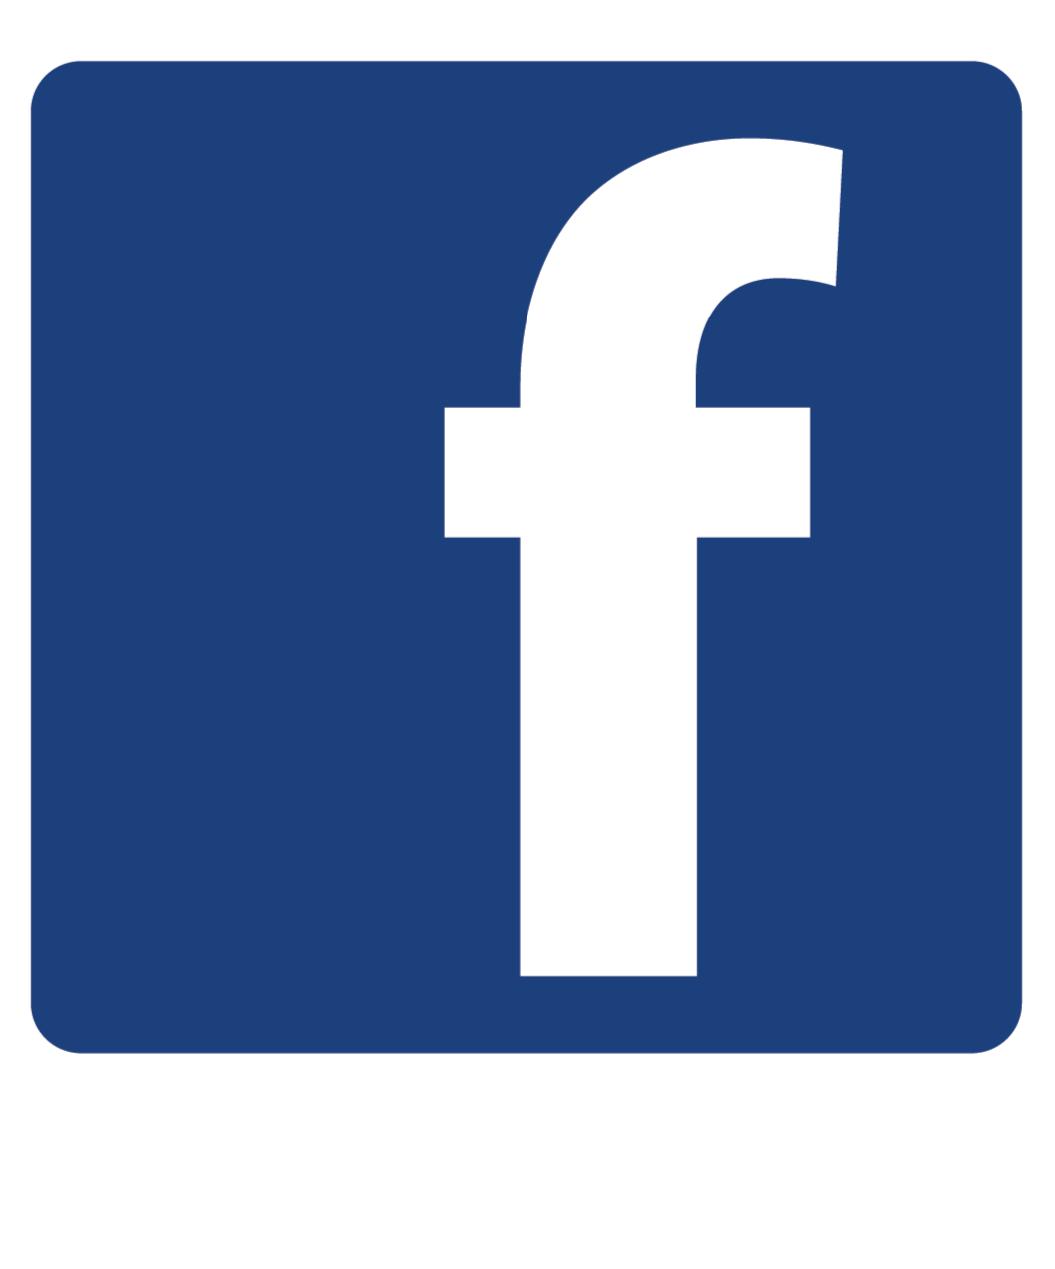 Facebook, Inc. Logo Computer Icons Like button.